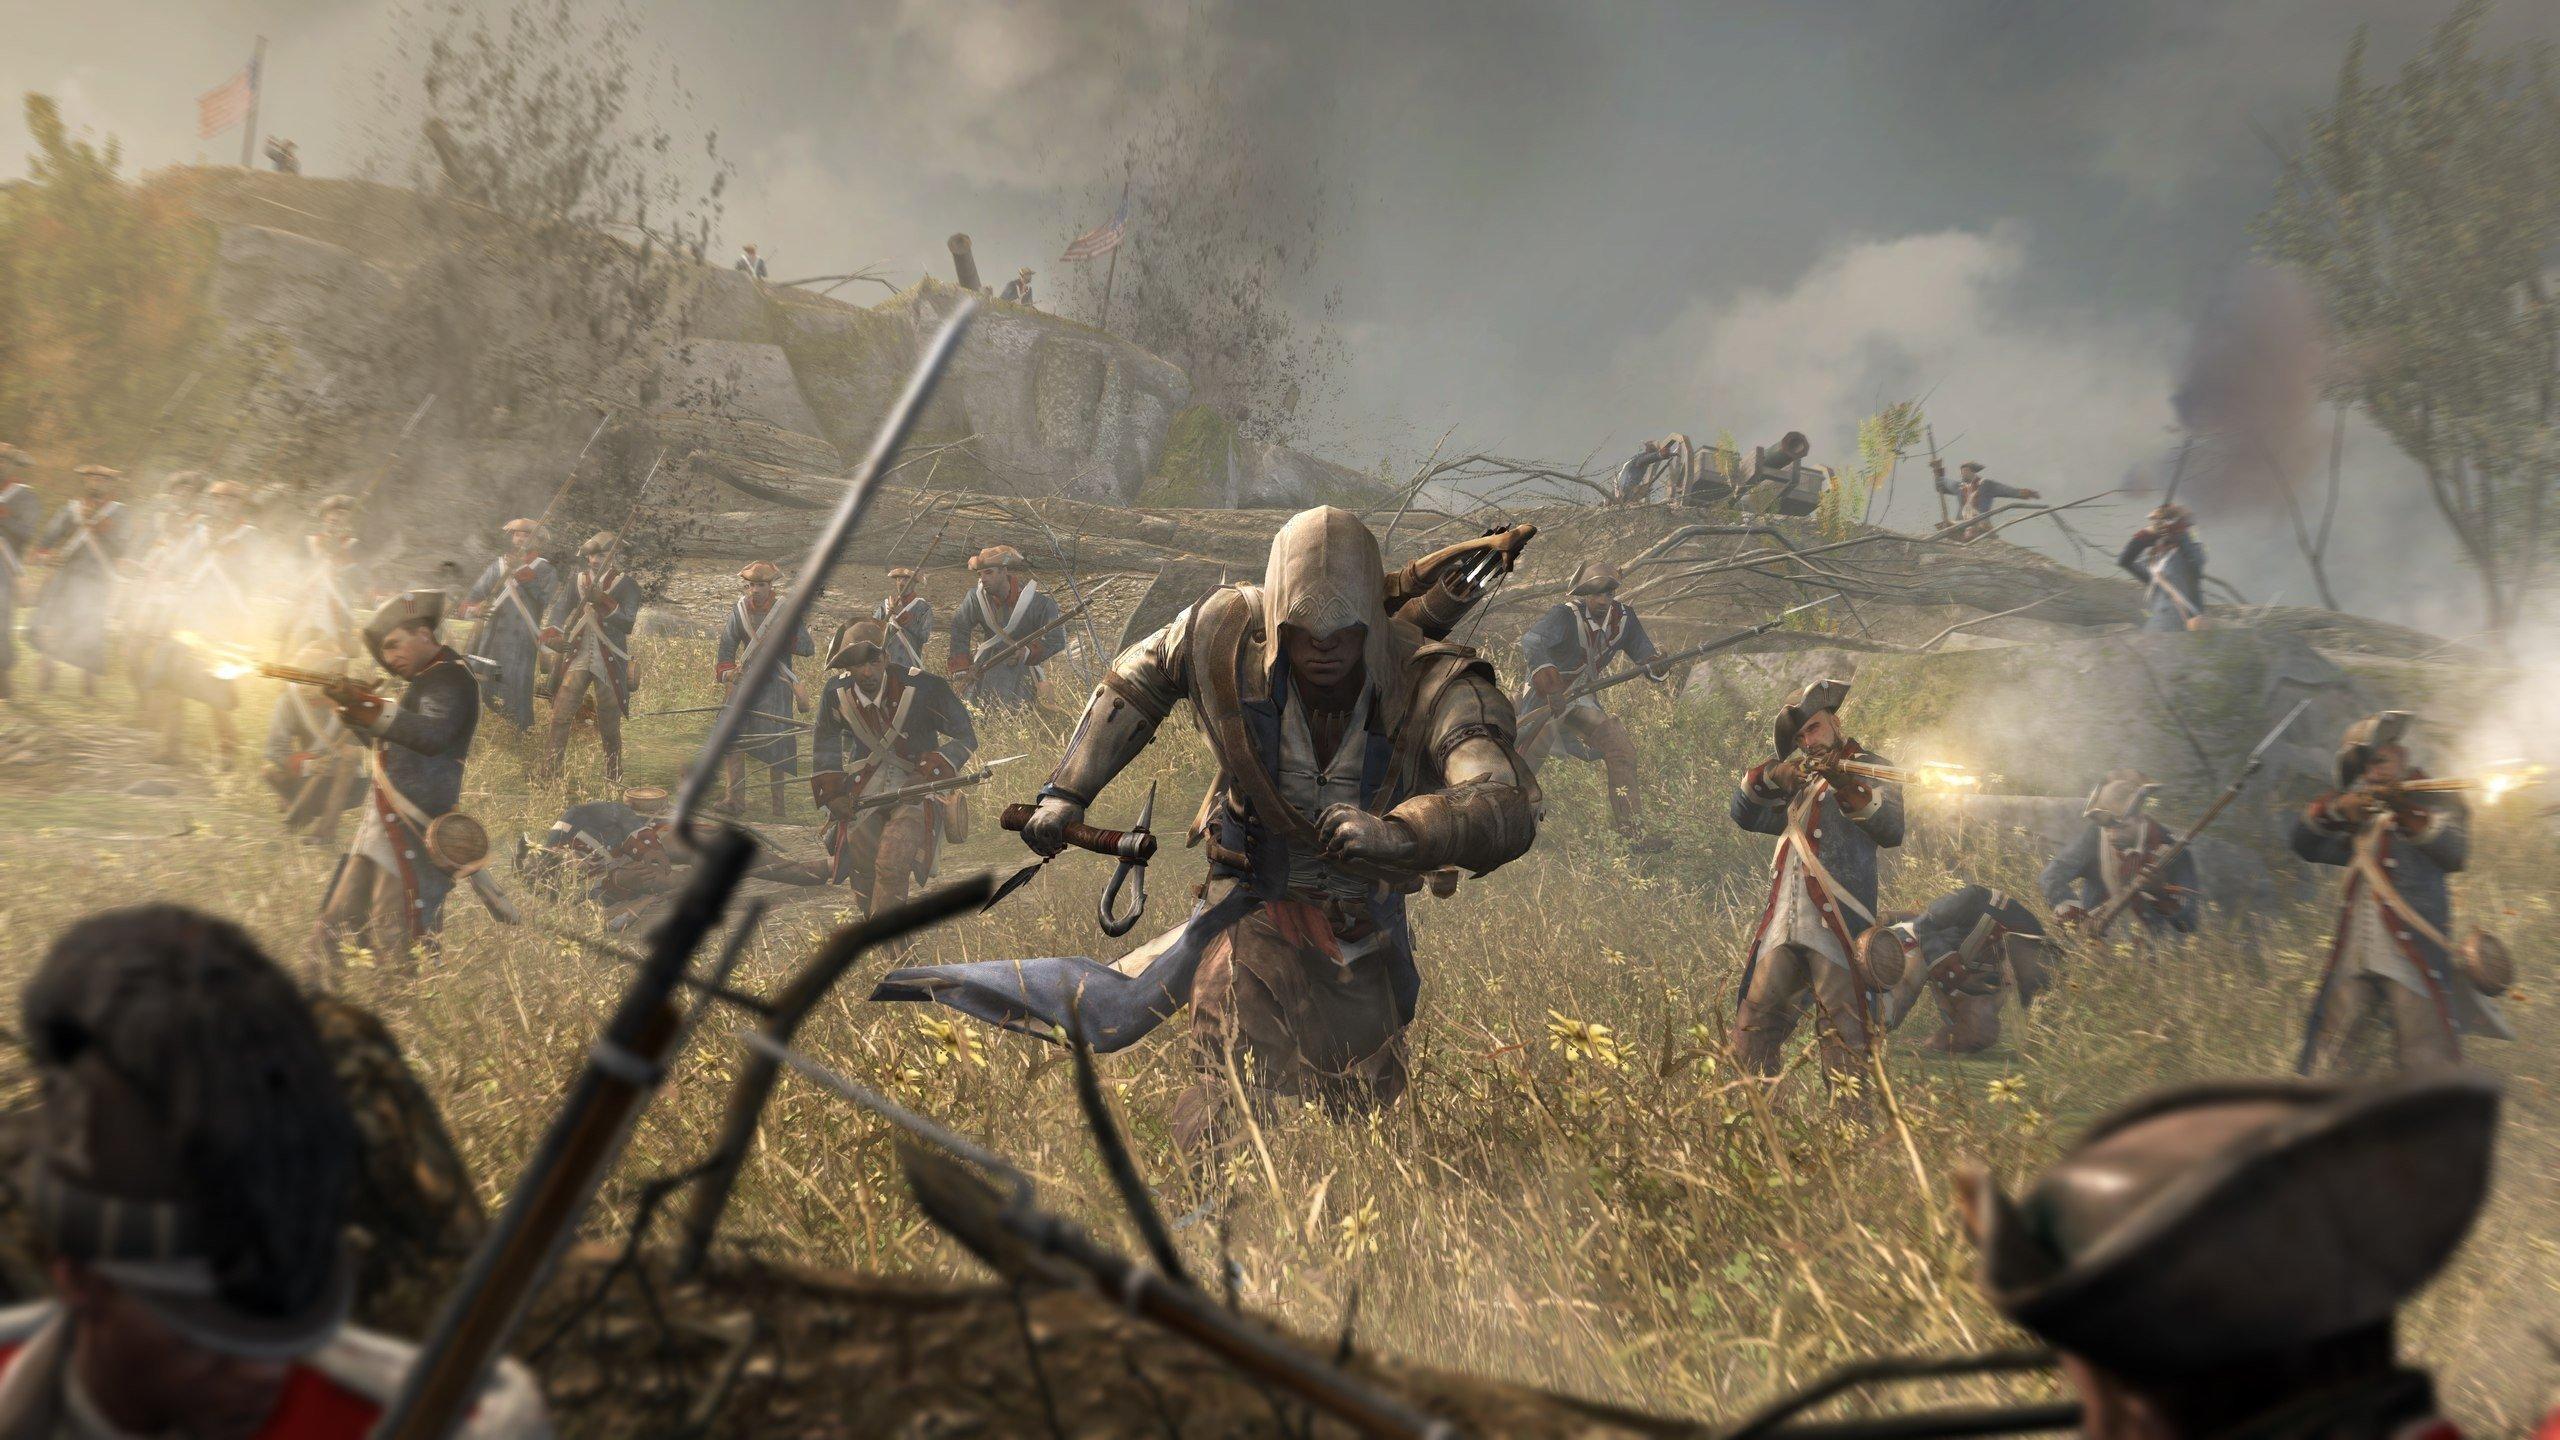 Free Download Download Assassins Creed 3 Wallpaper Id447307 Hd